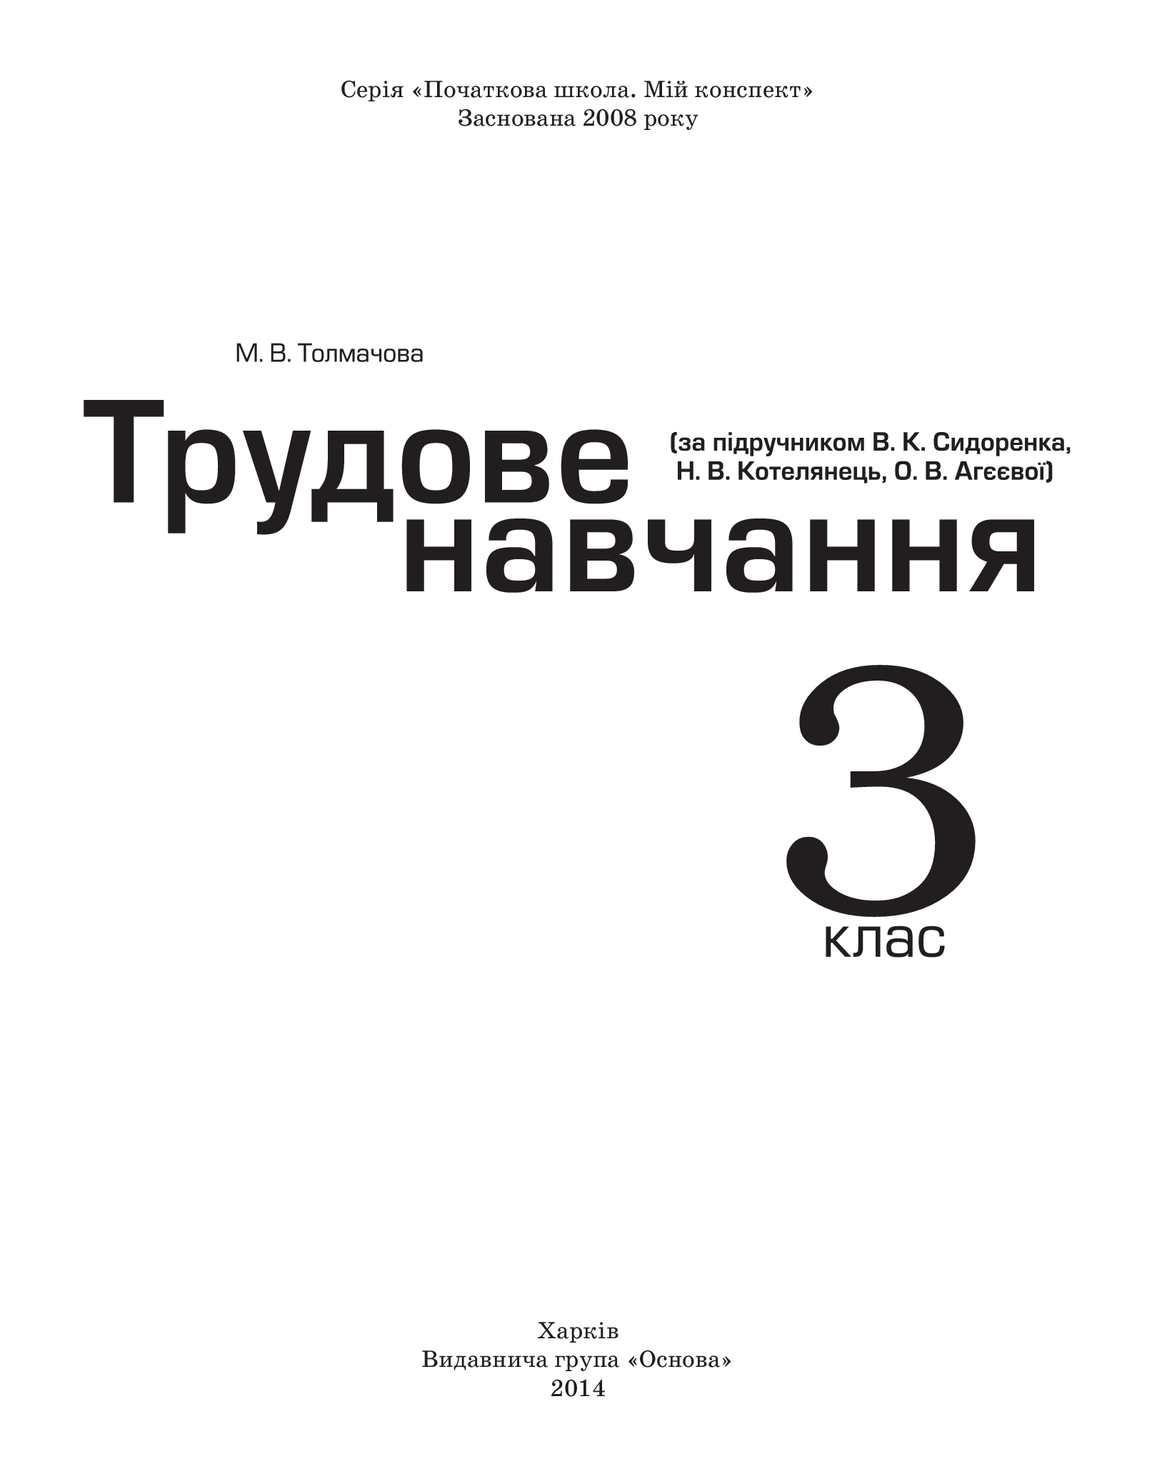 Calaméo - 52 Tolmachova Trudove Navch 3kl Sidorenko dfd17efb66054